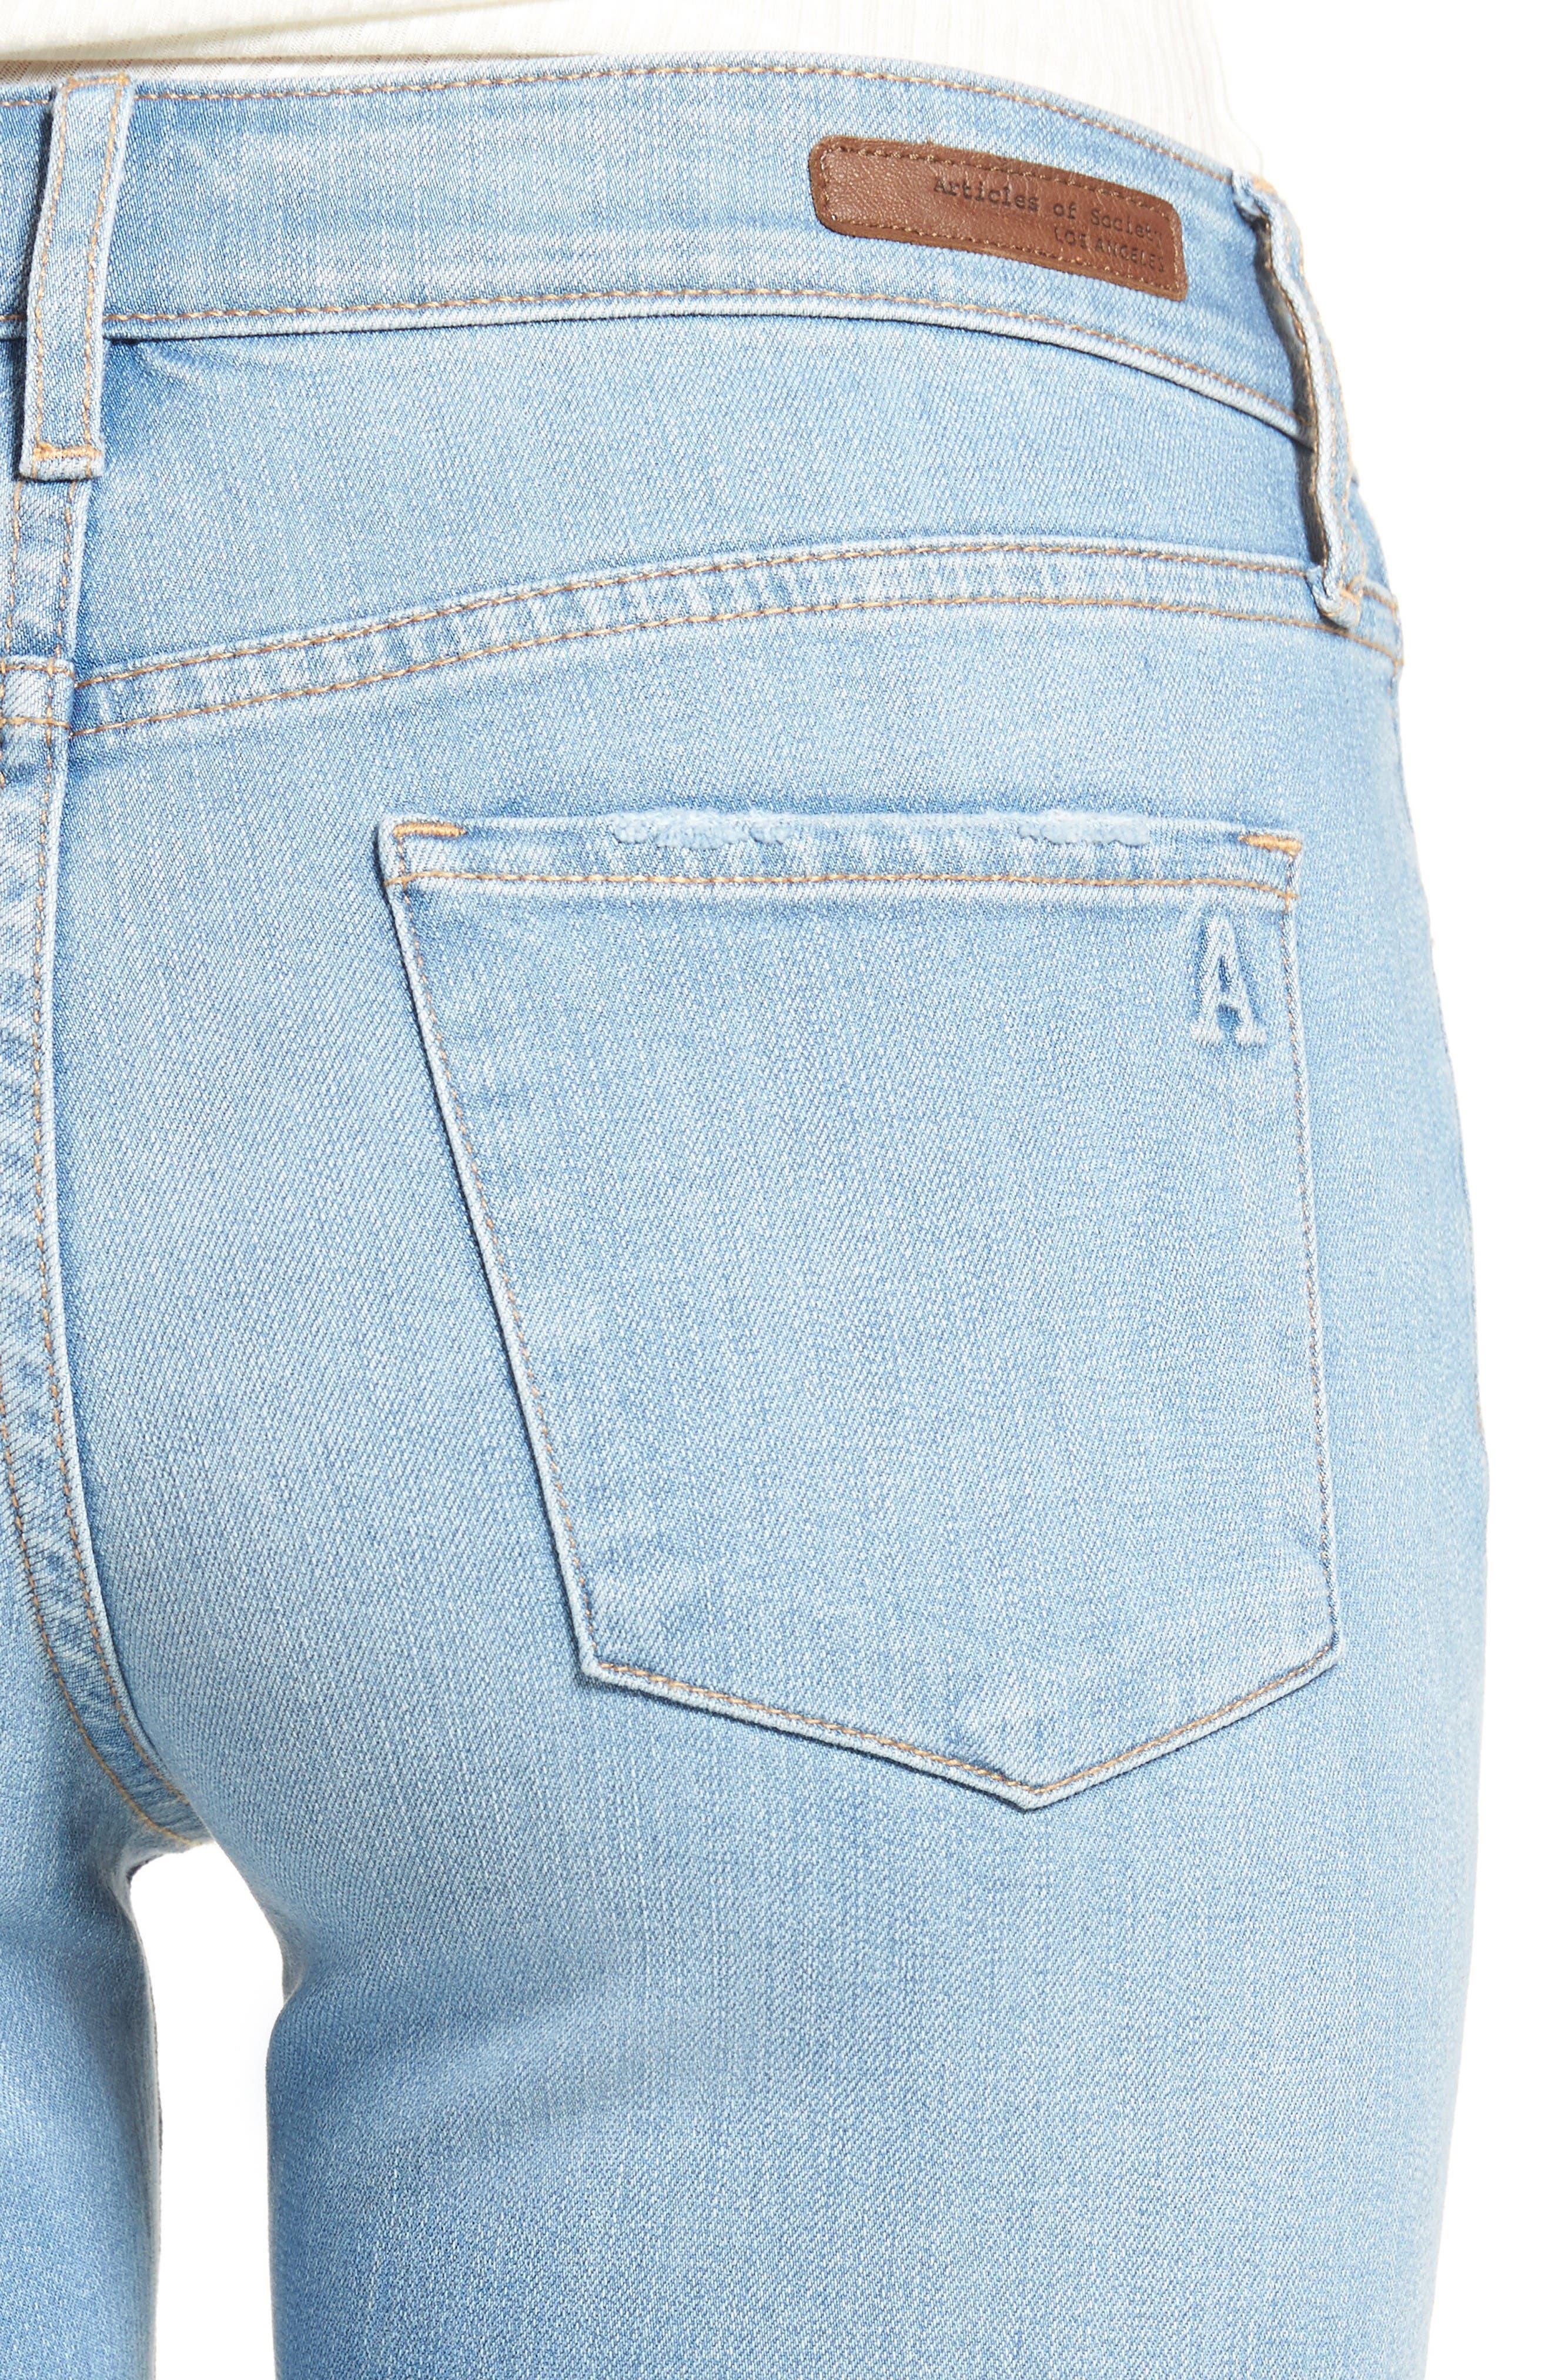 Alternate Image 4  - Articles of Society Sarah Skinny Jeans (Bay)